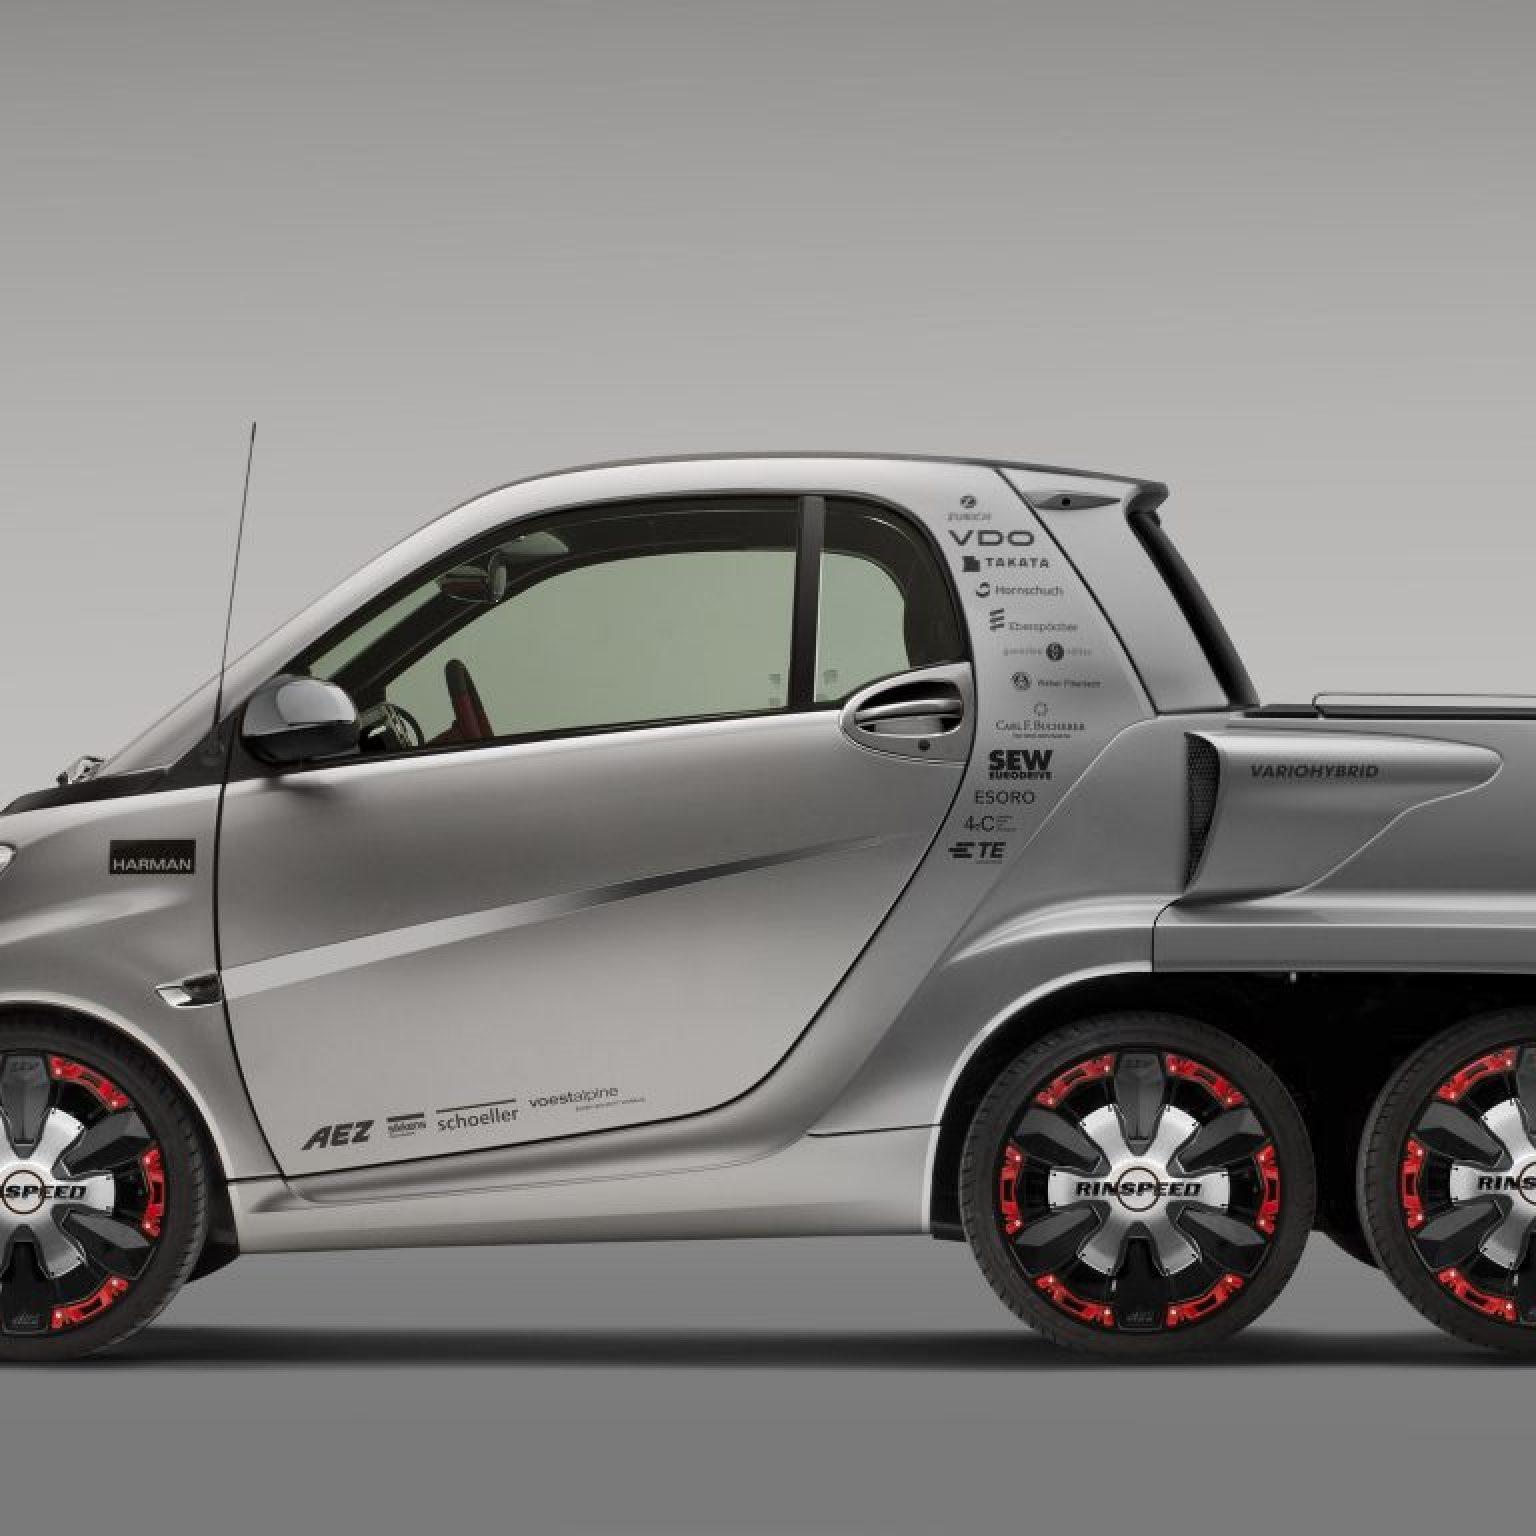 2012 Rinspeed Dock + Go Concept